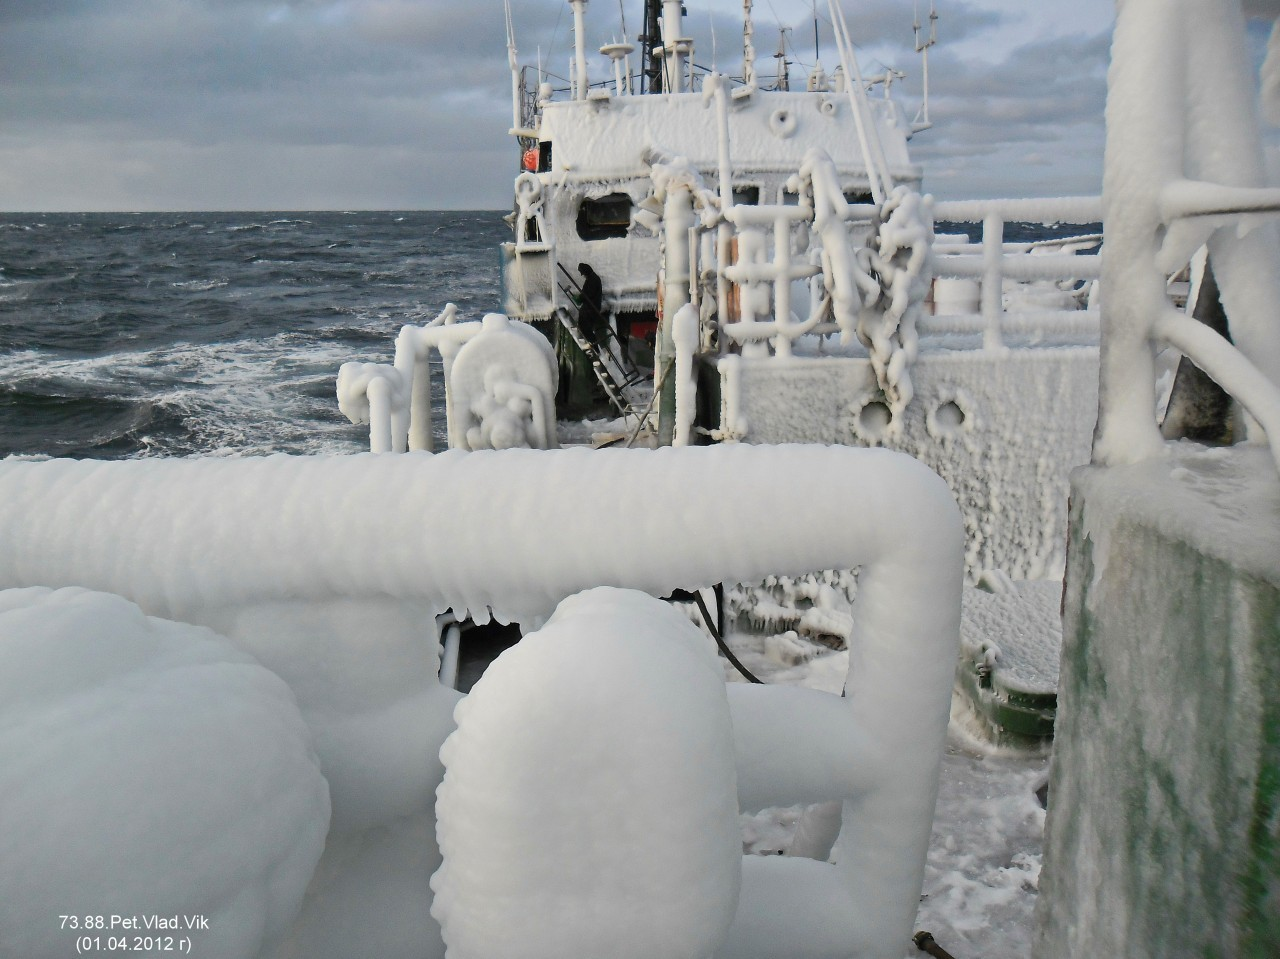 7388PetVladVik: Морские картинки.  В Татарском проливе.